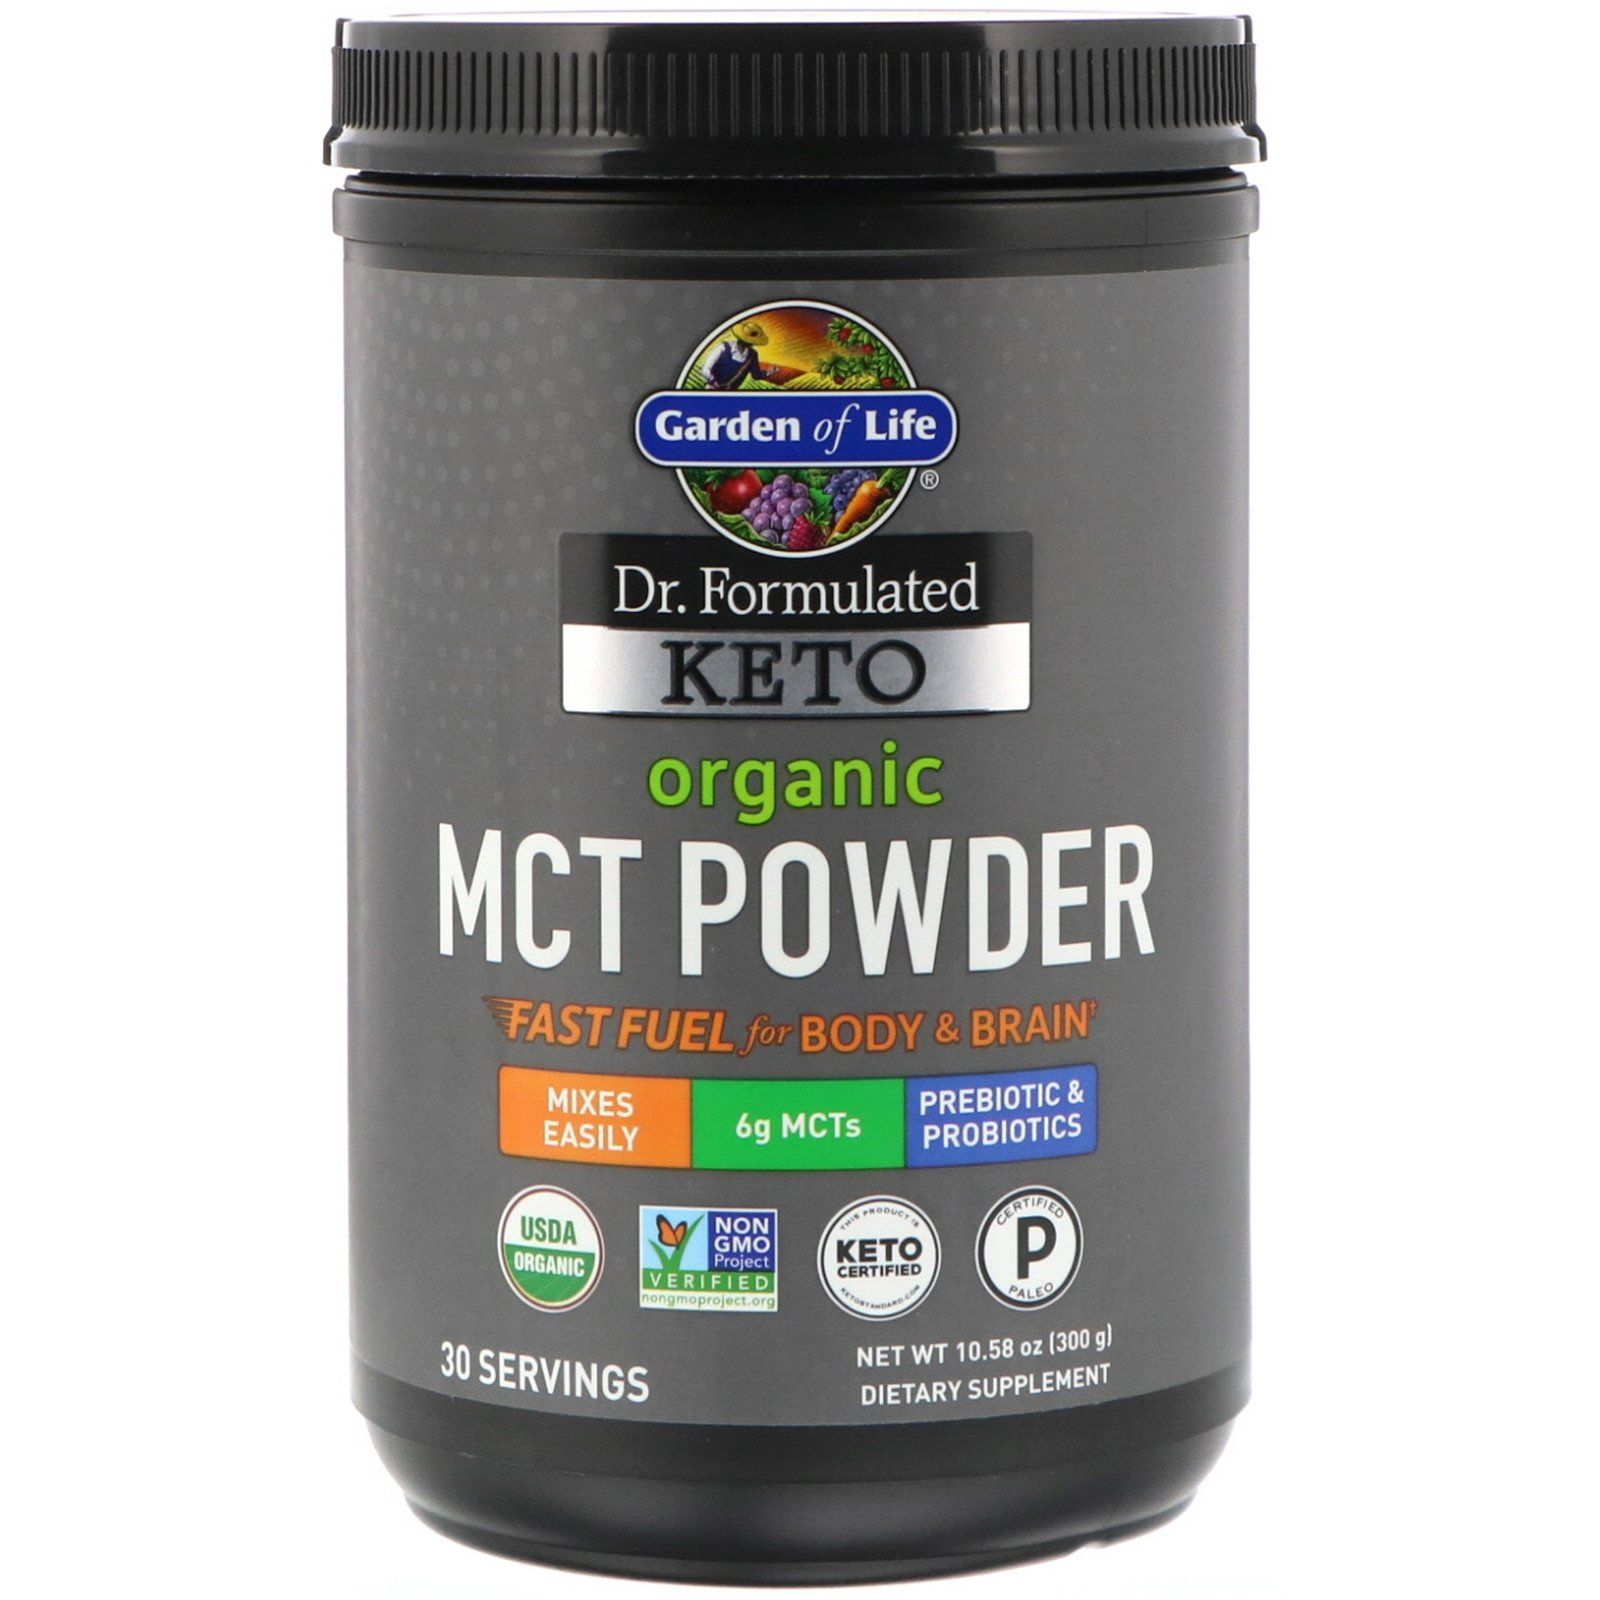 Garden of life dr formulated keto organic mct powder